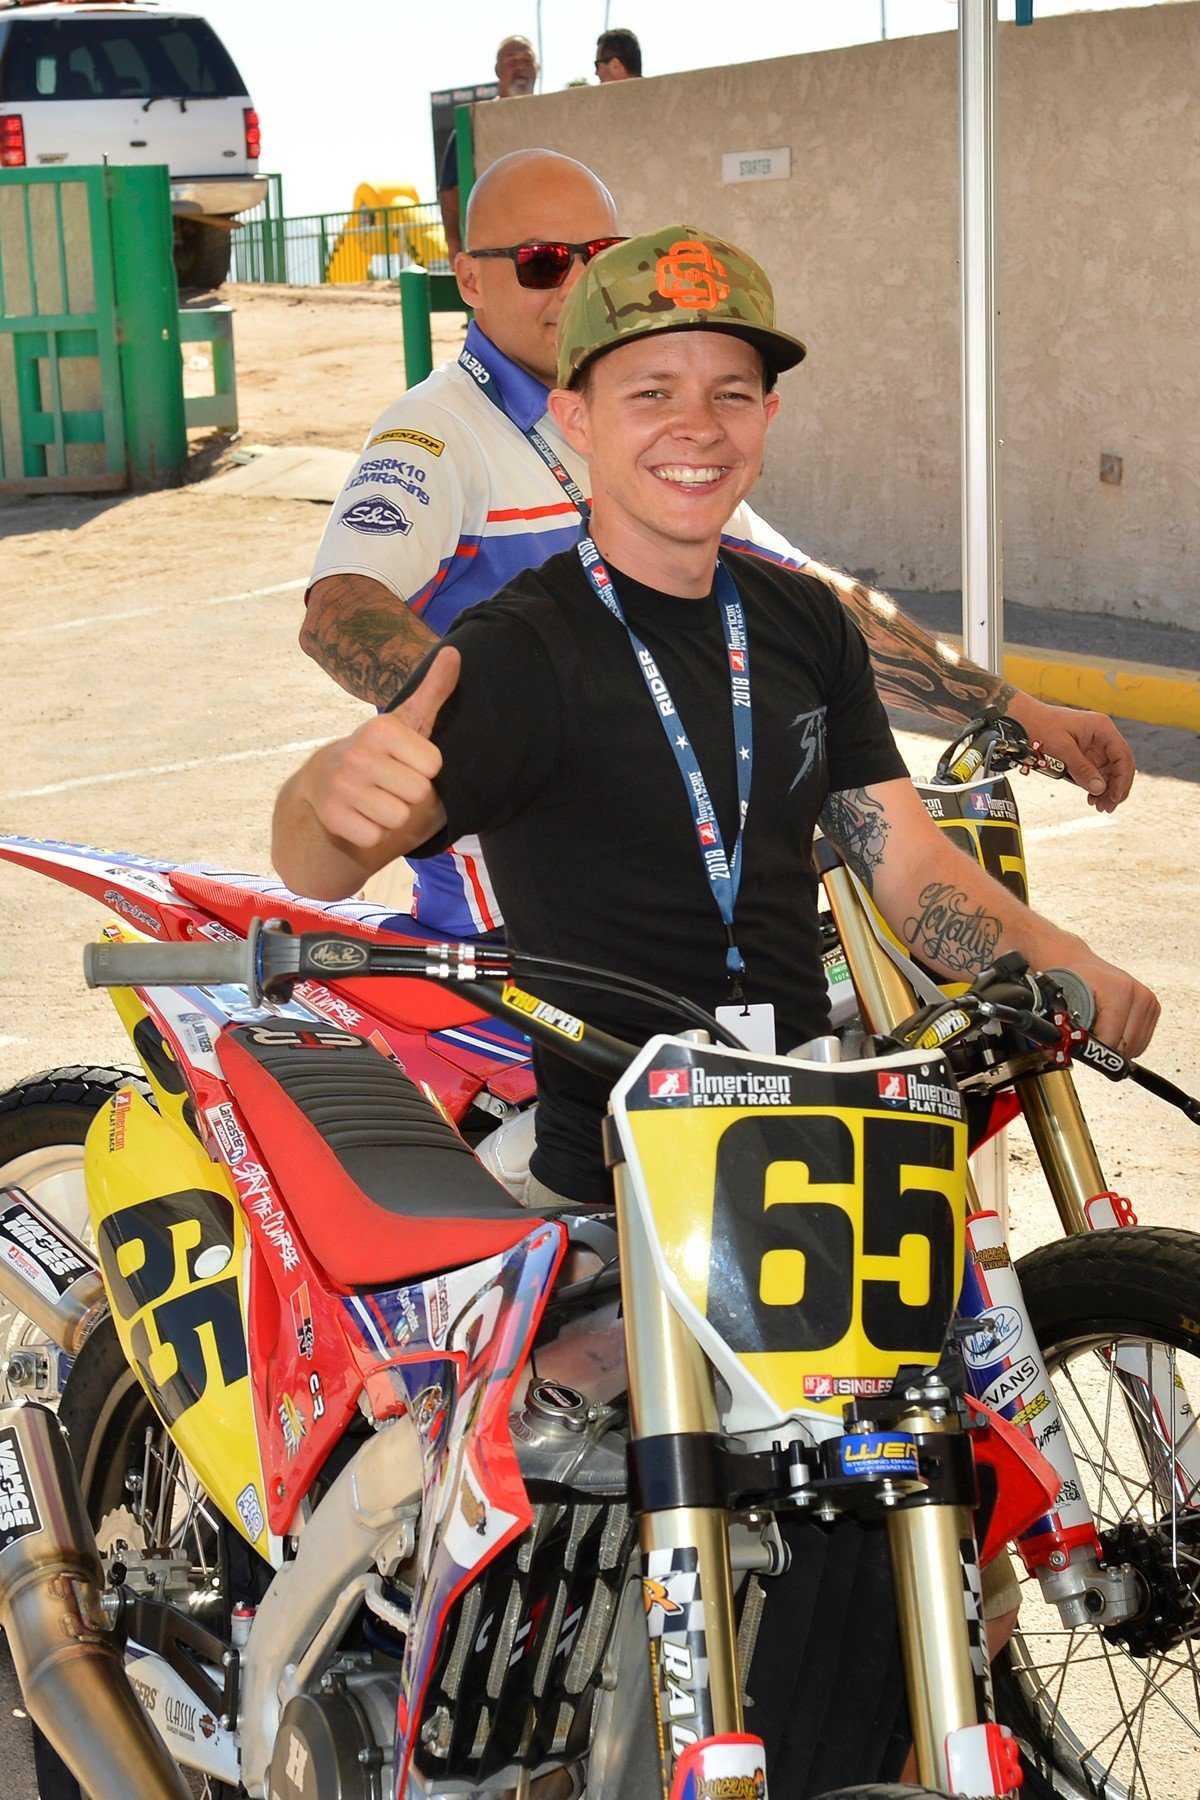 Cory Texter: American Flat Track Racing Extraordinaire